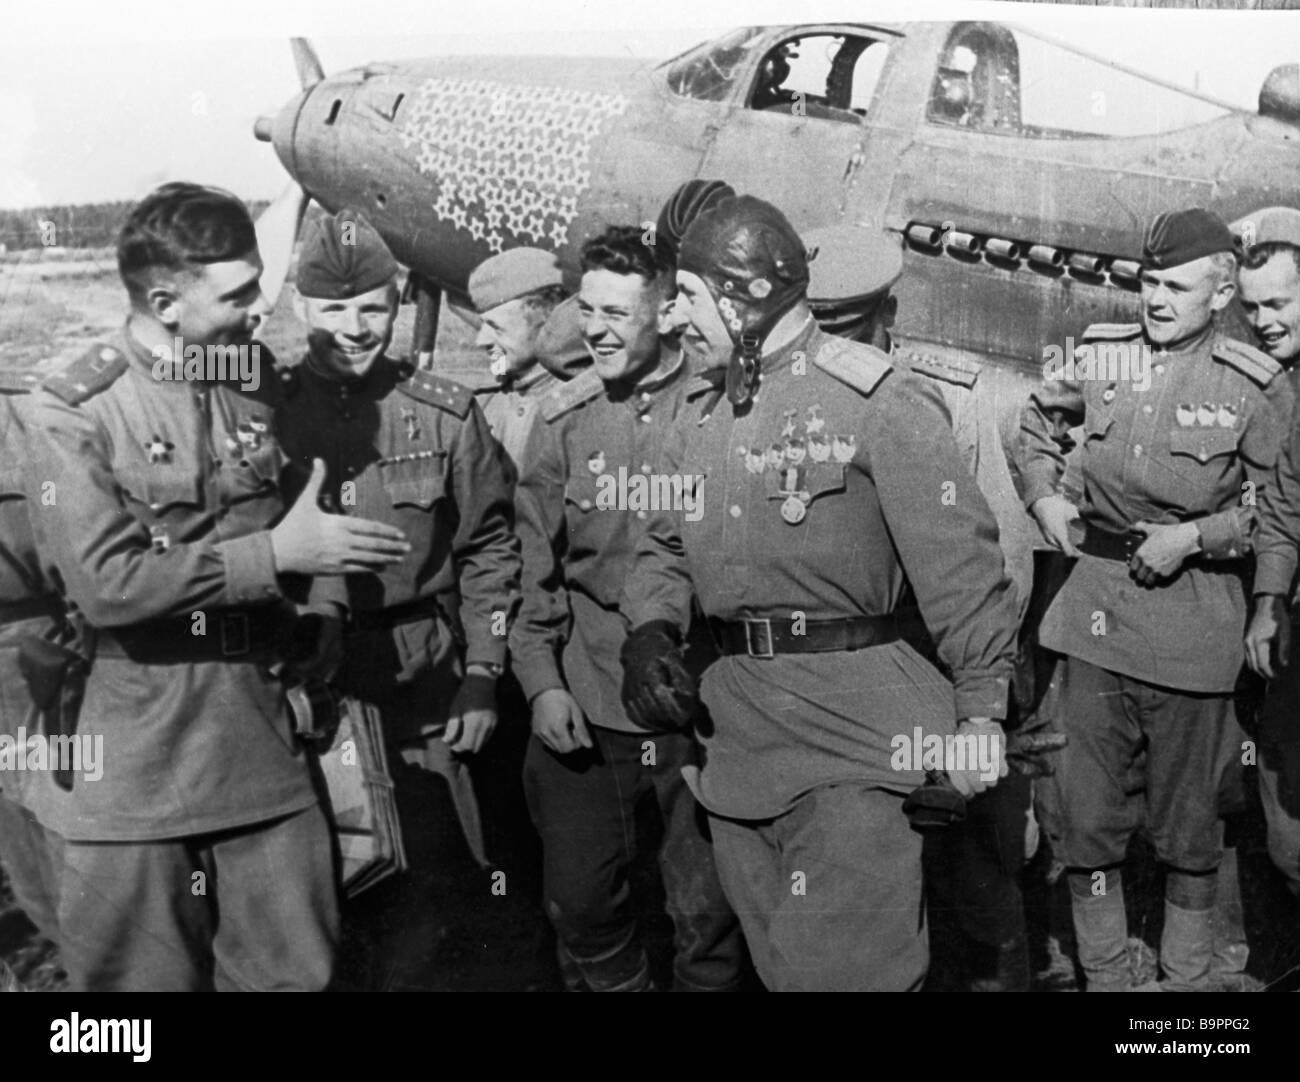 Glorious pilot Alexander Pokryshkin center talking to fellow pilots after a successful battle - Stock Image